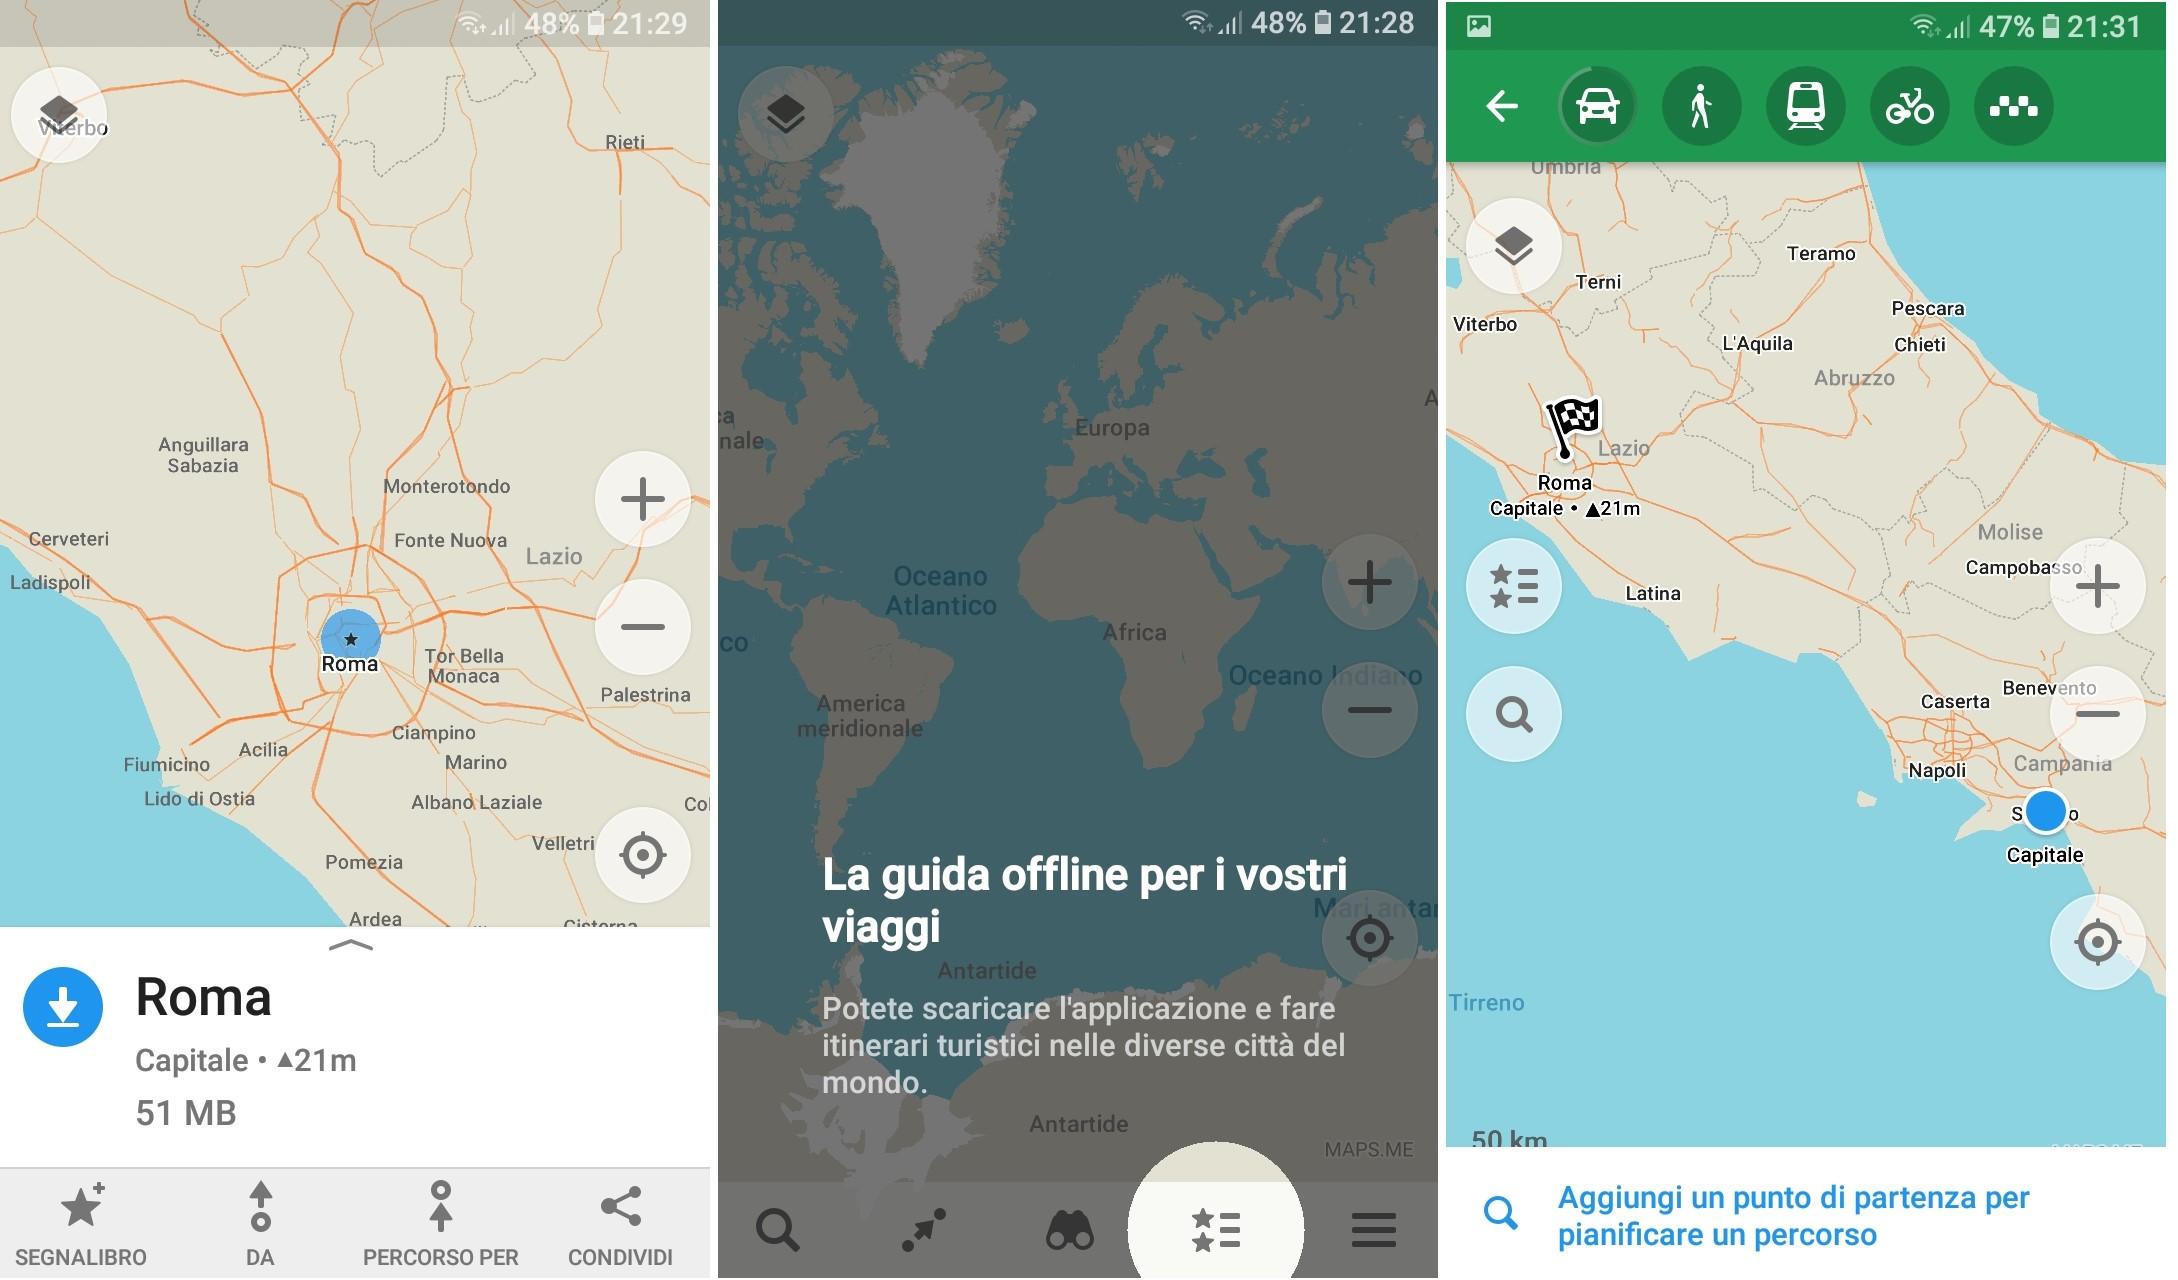 Applicazione maps.me